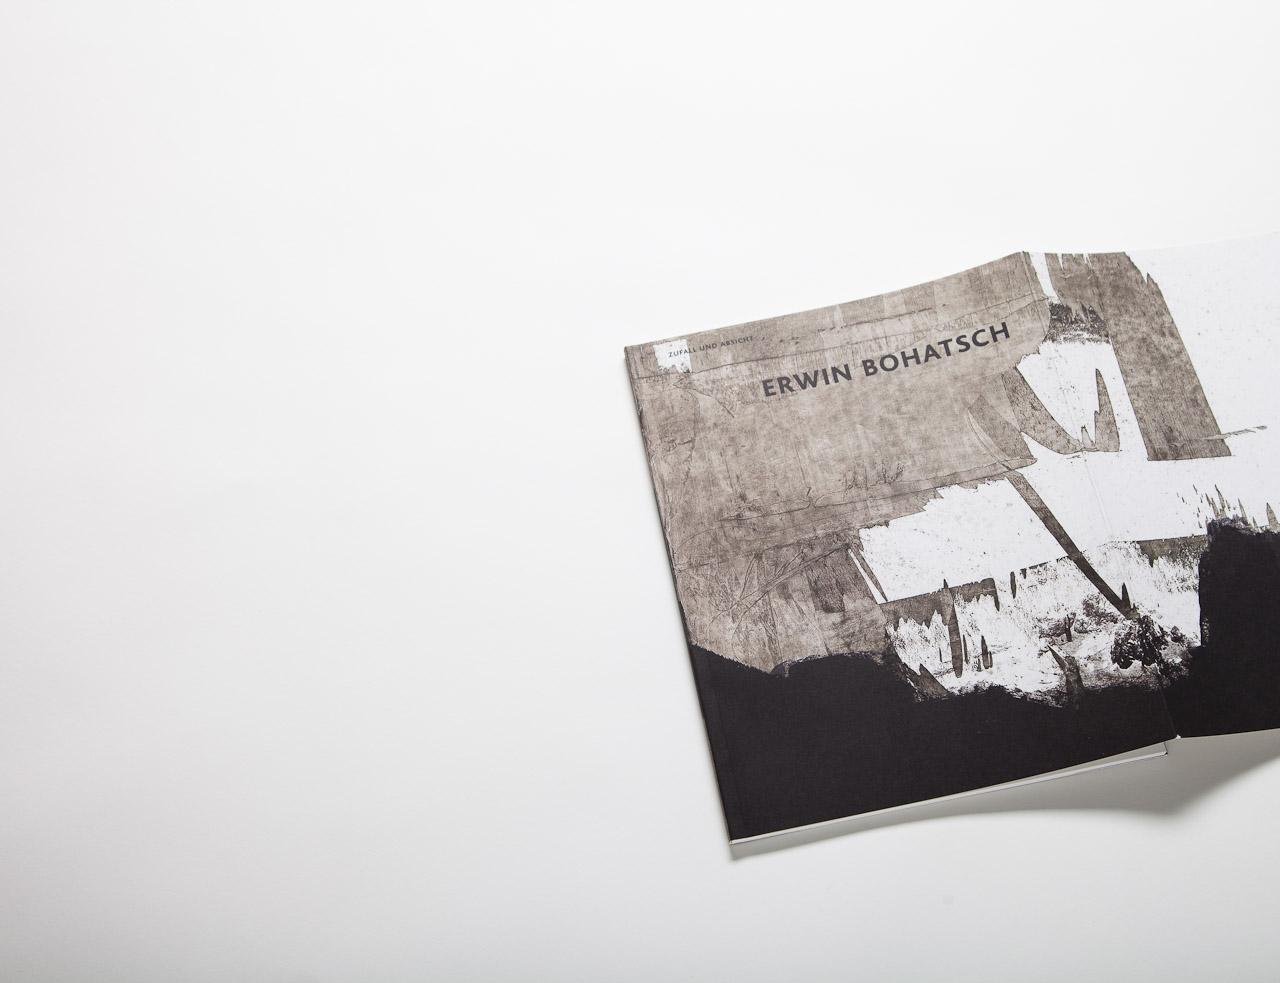 Erwin_Bohatsch_Katalog-8830